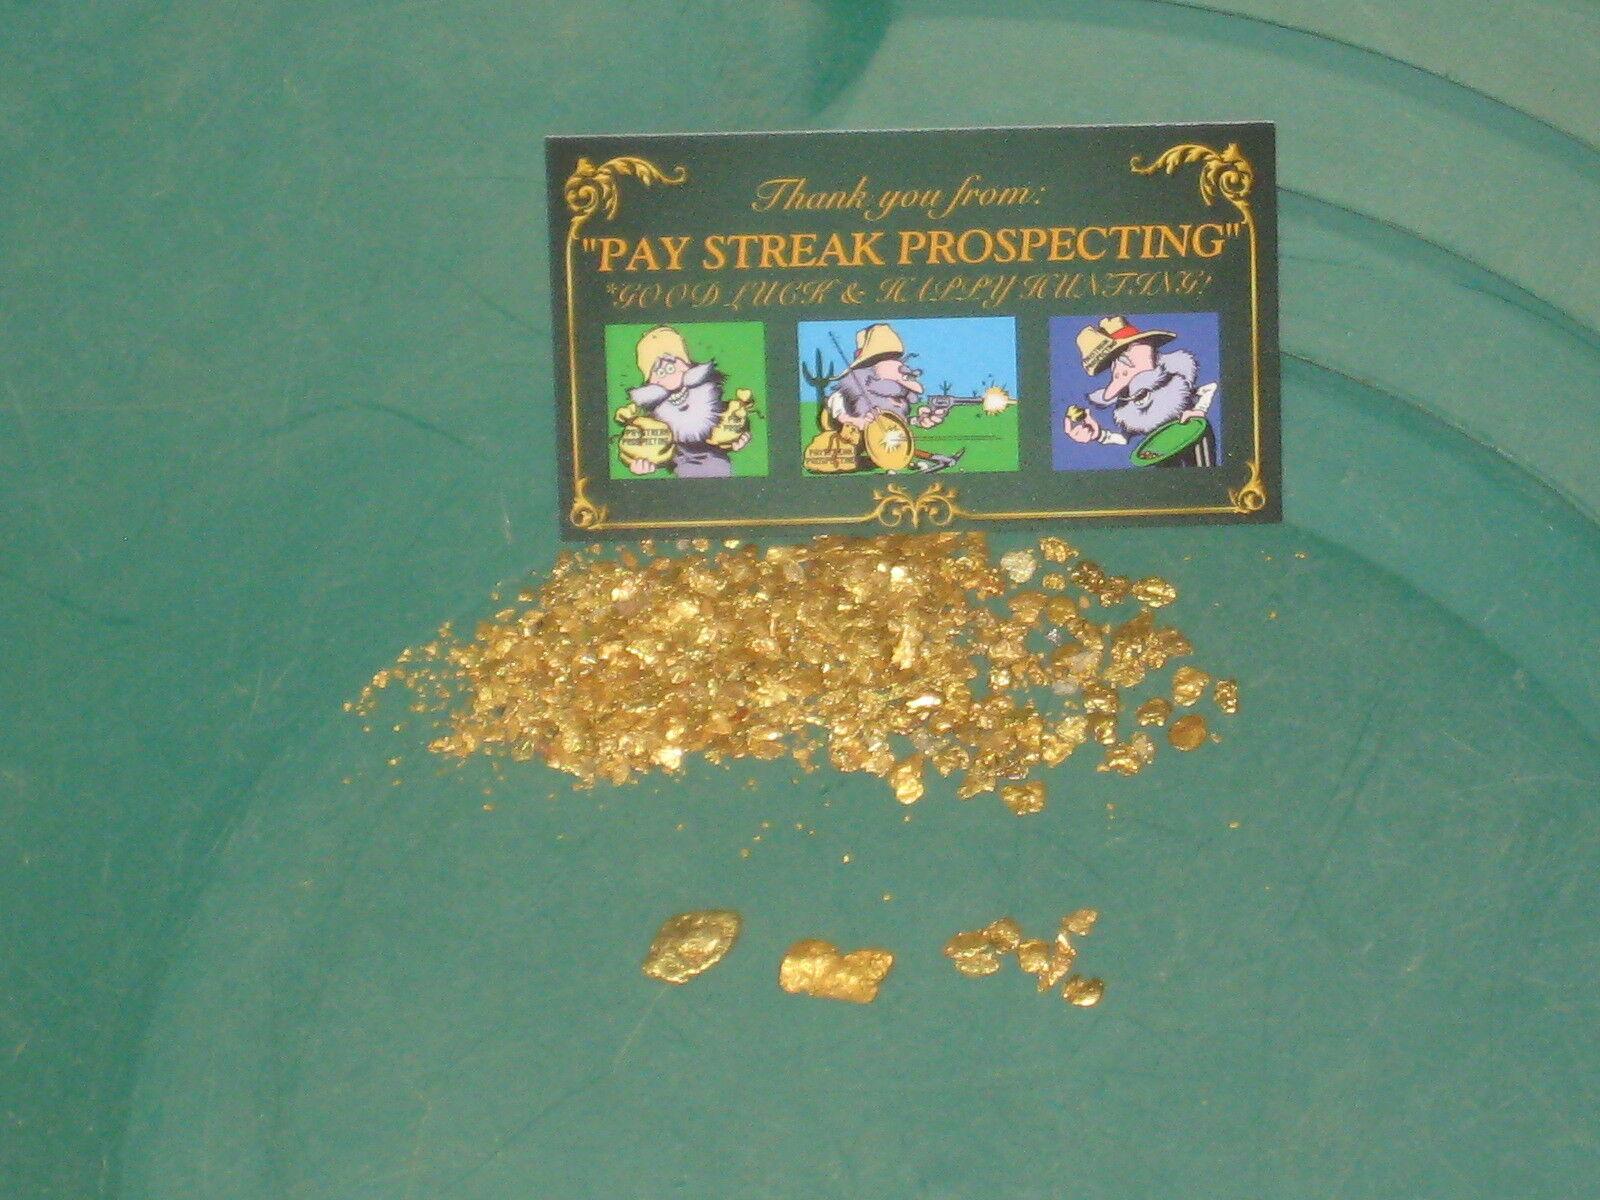 pay_streak_prospecting